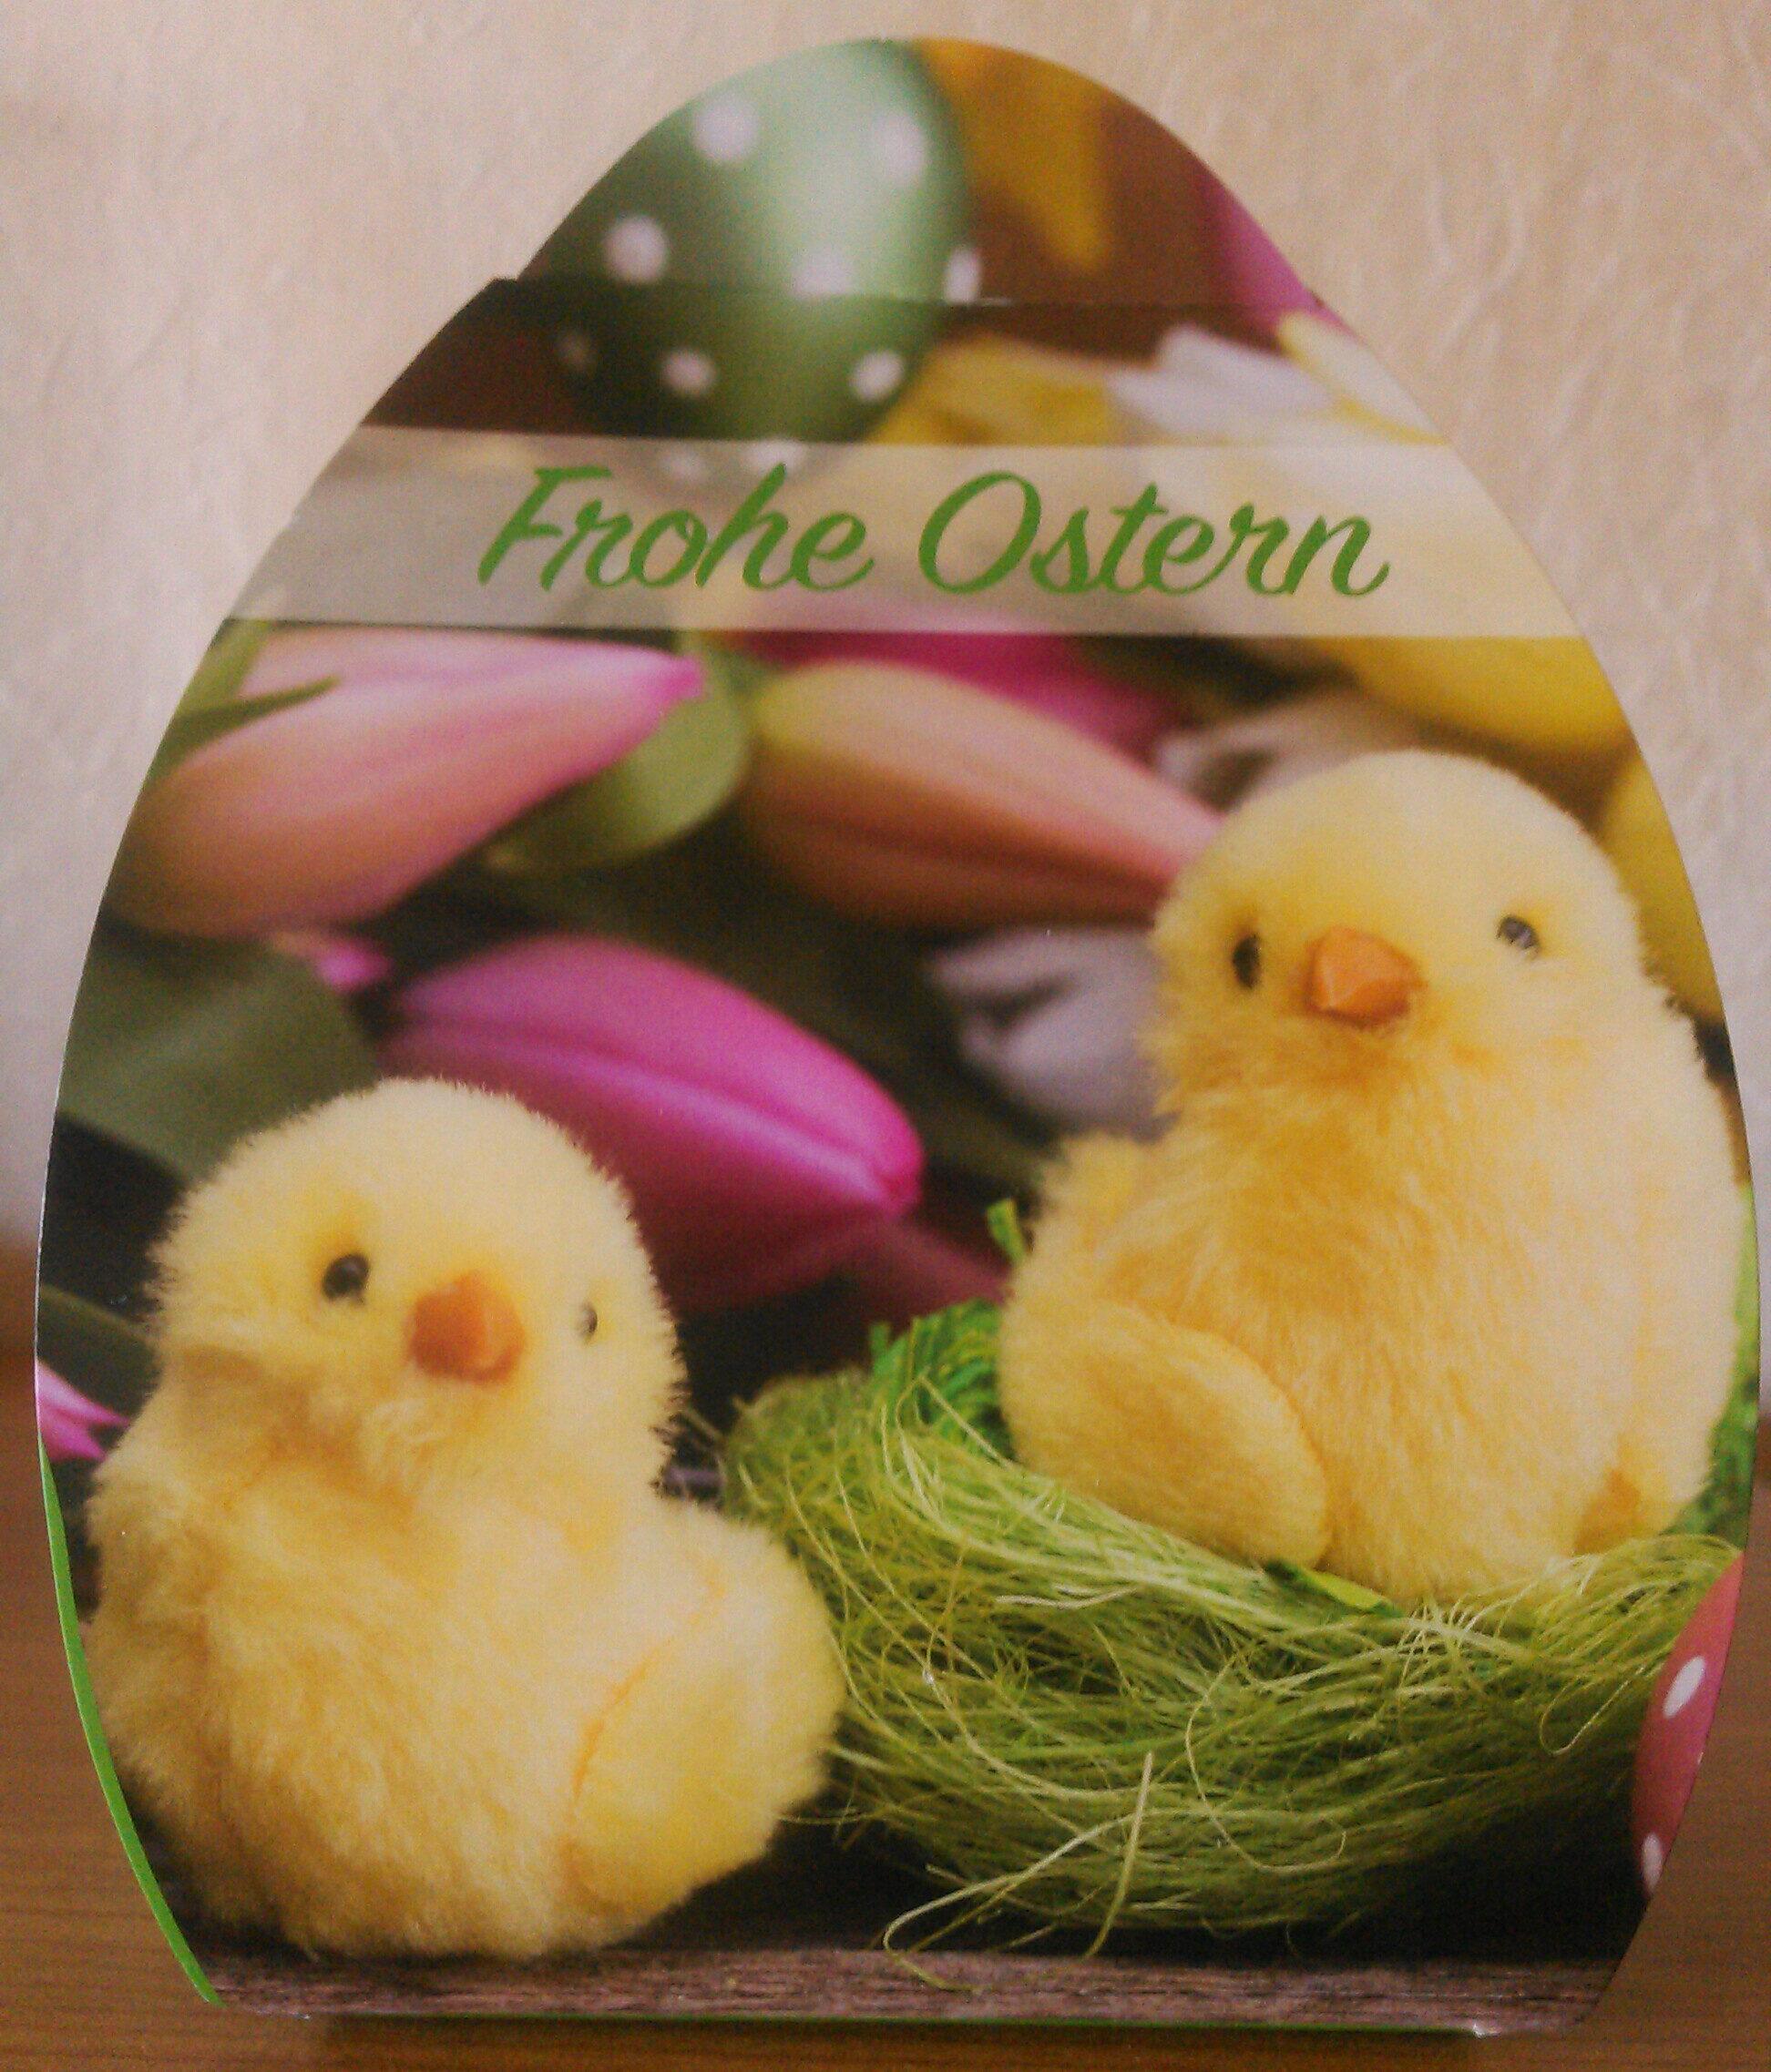 Frohe Ostern - Produit